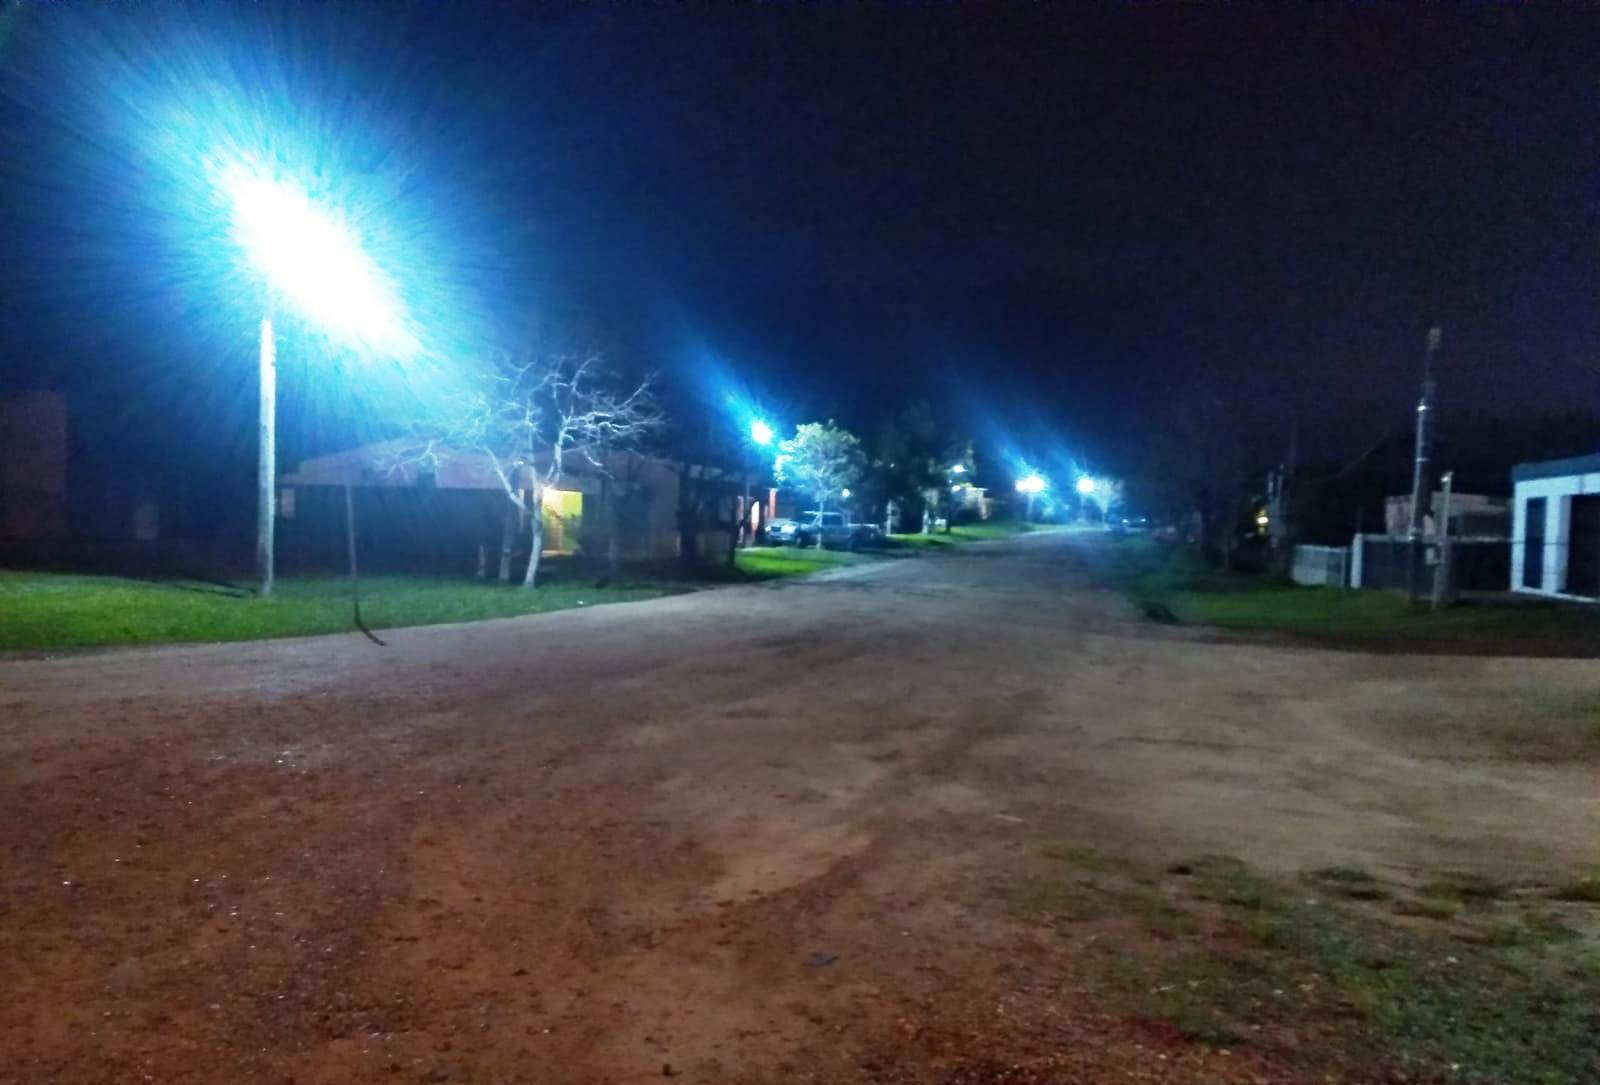 Luces Policiacas A Base De Leds Circuitos Alternativos